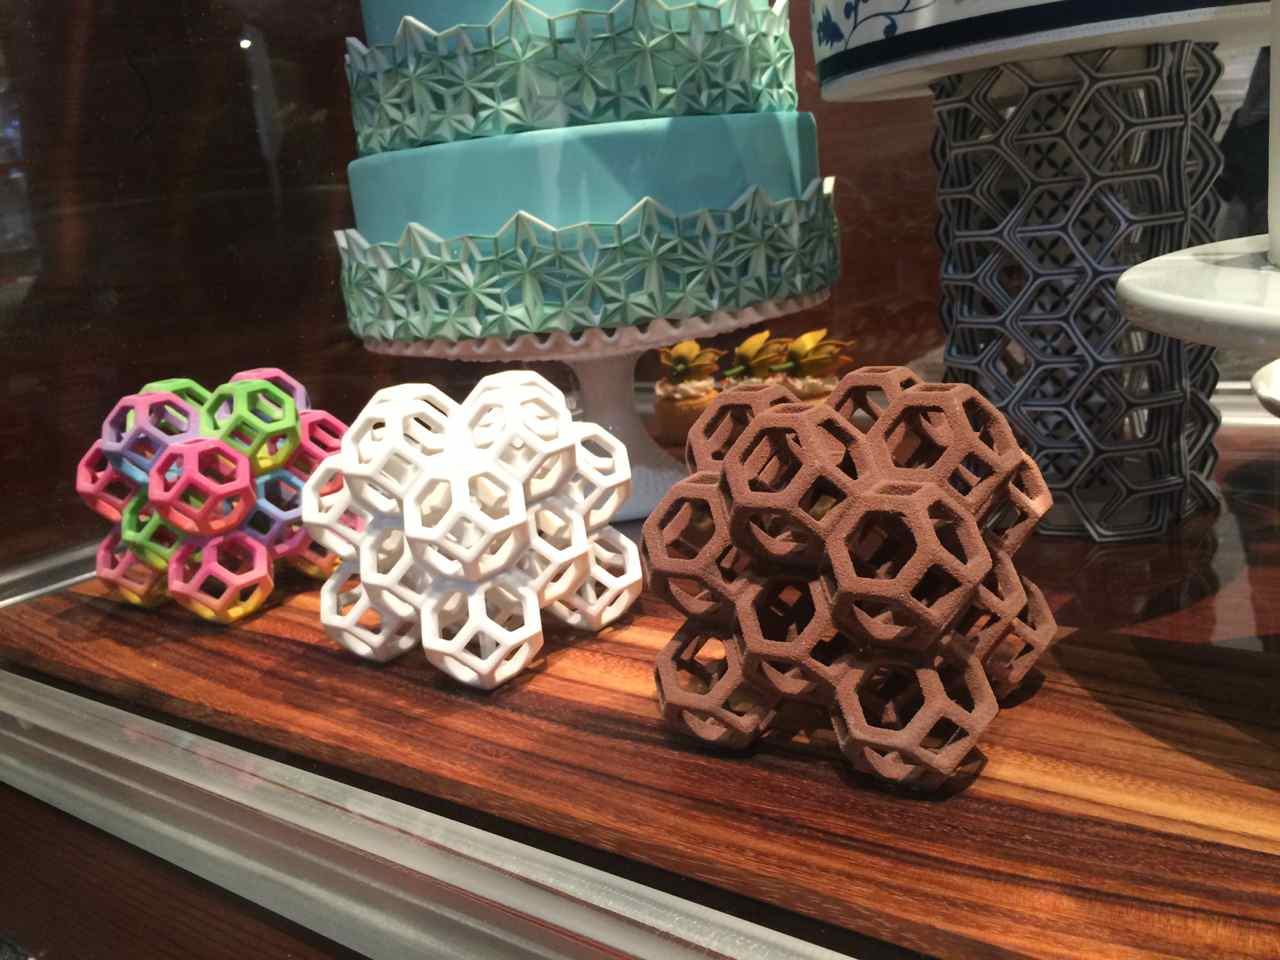 CES2015 Recap – FinalProof and 3DP Candy!